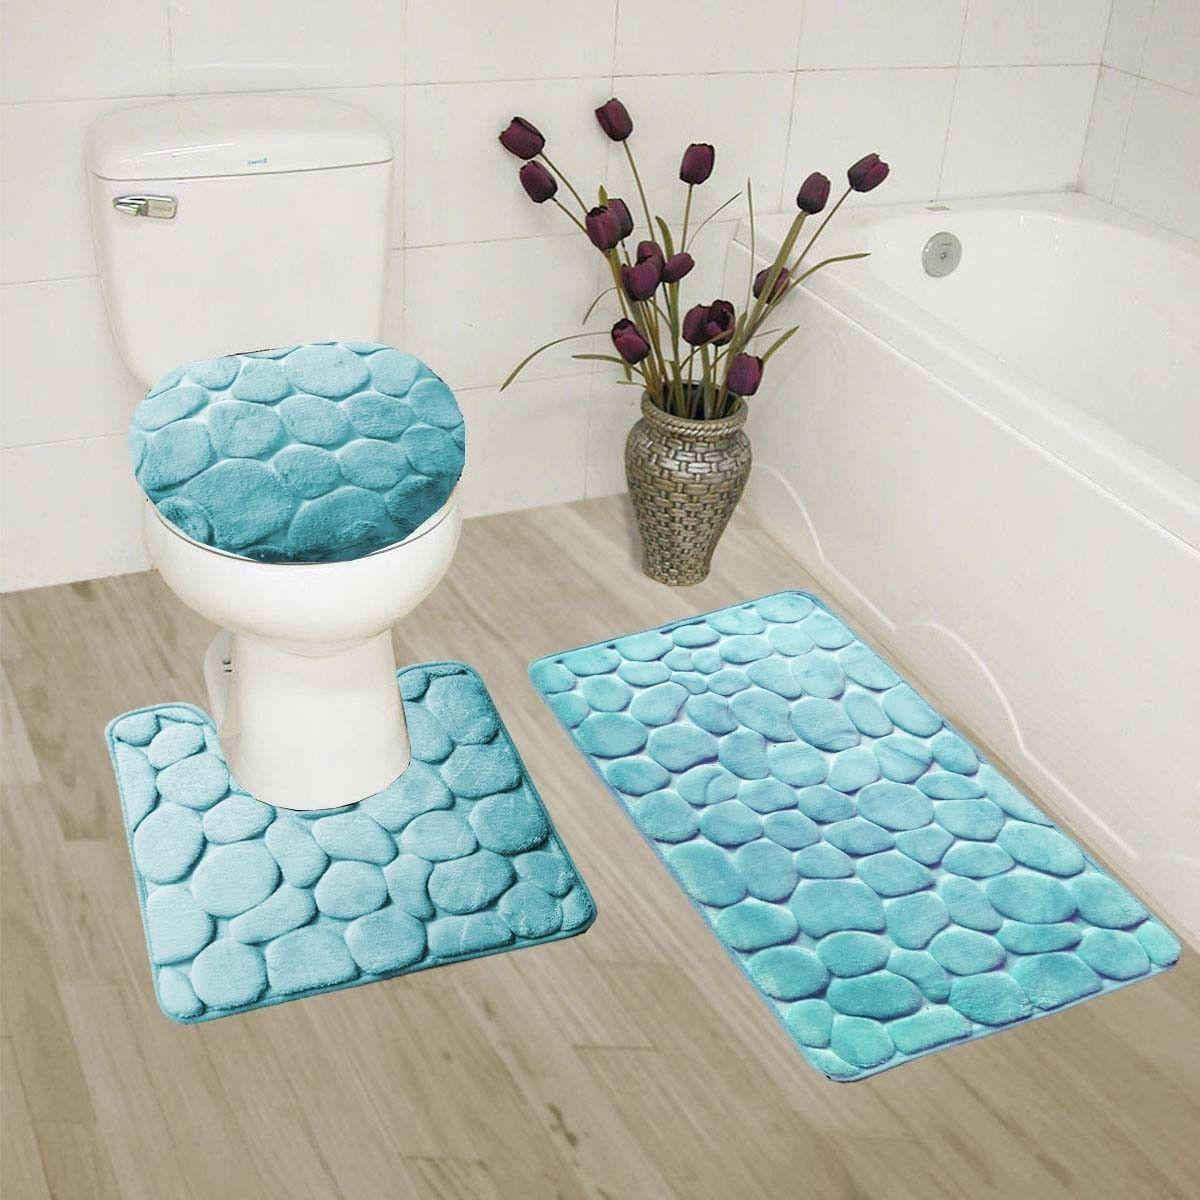 Bathmats Rugs And Toilet Covers 133696 Rock Aqua 3pc Embossed